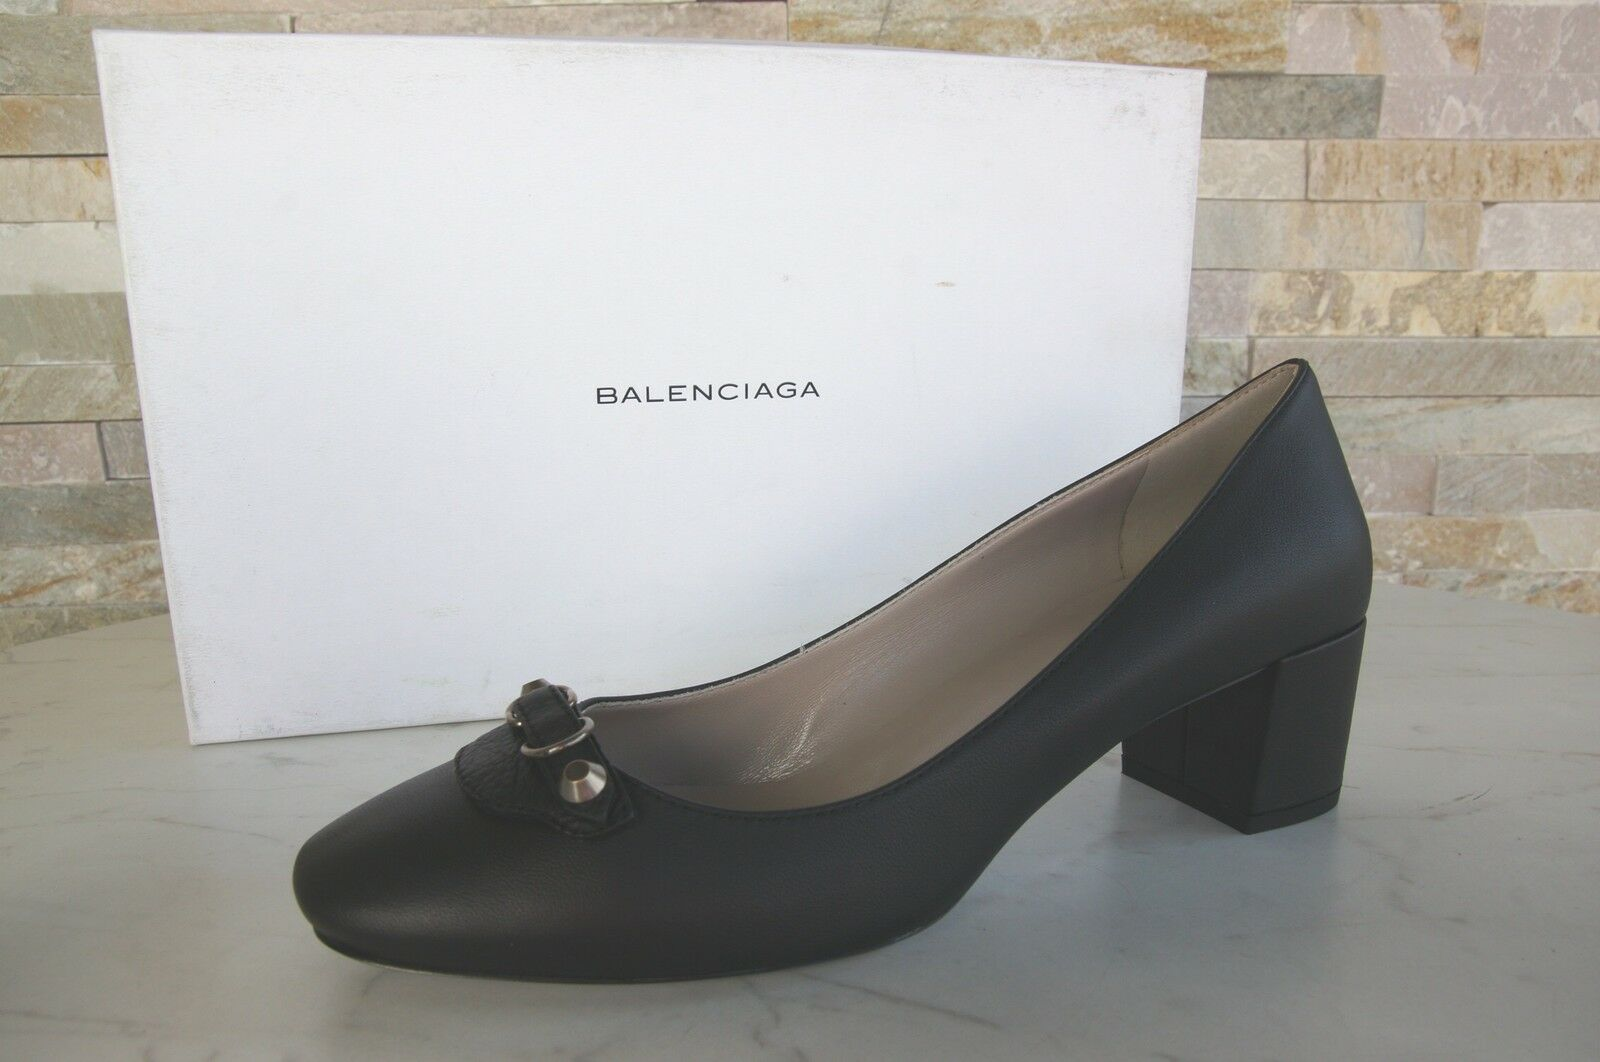 Luxus BALENCIAGA Gr 41 Pumps Halbschuhe Slipper Schuhe schwarz neu ehem